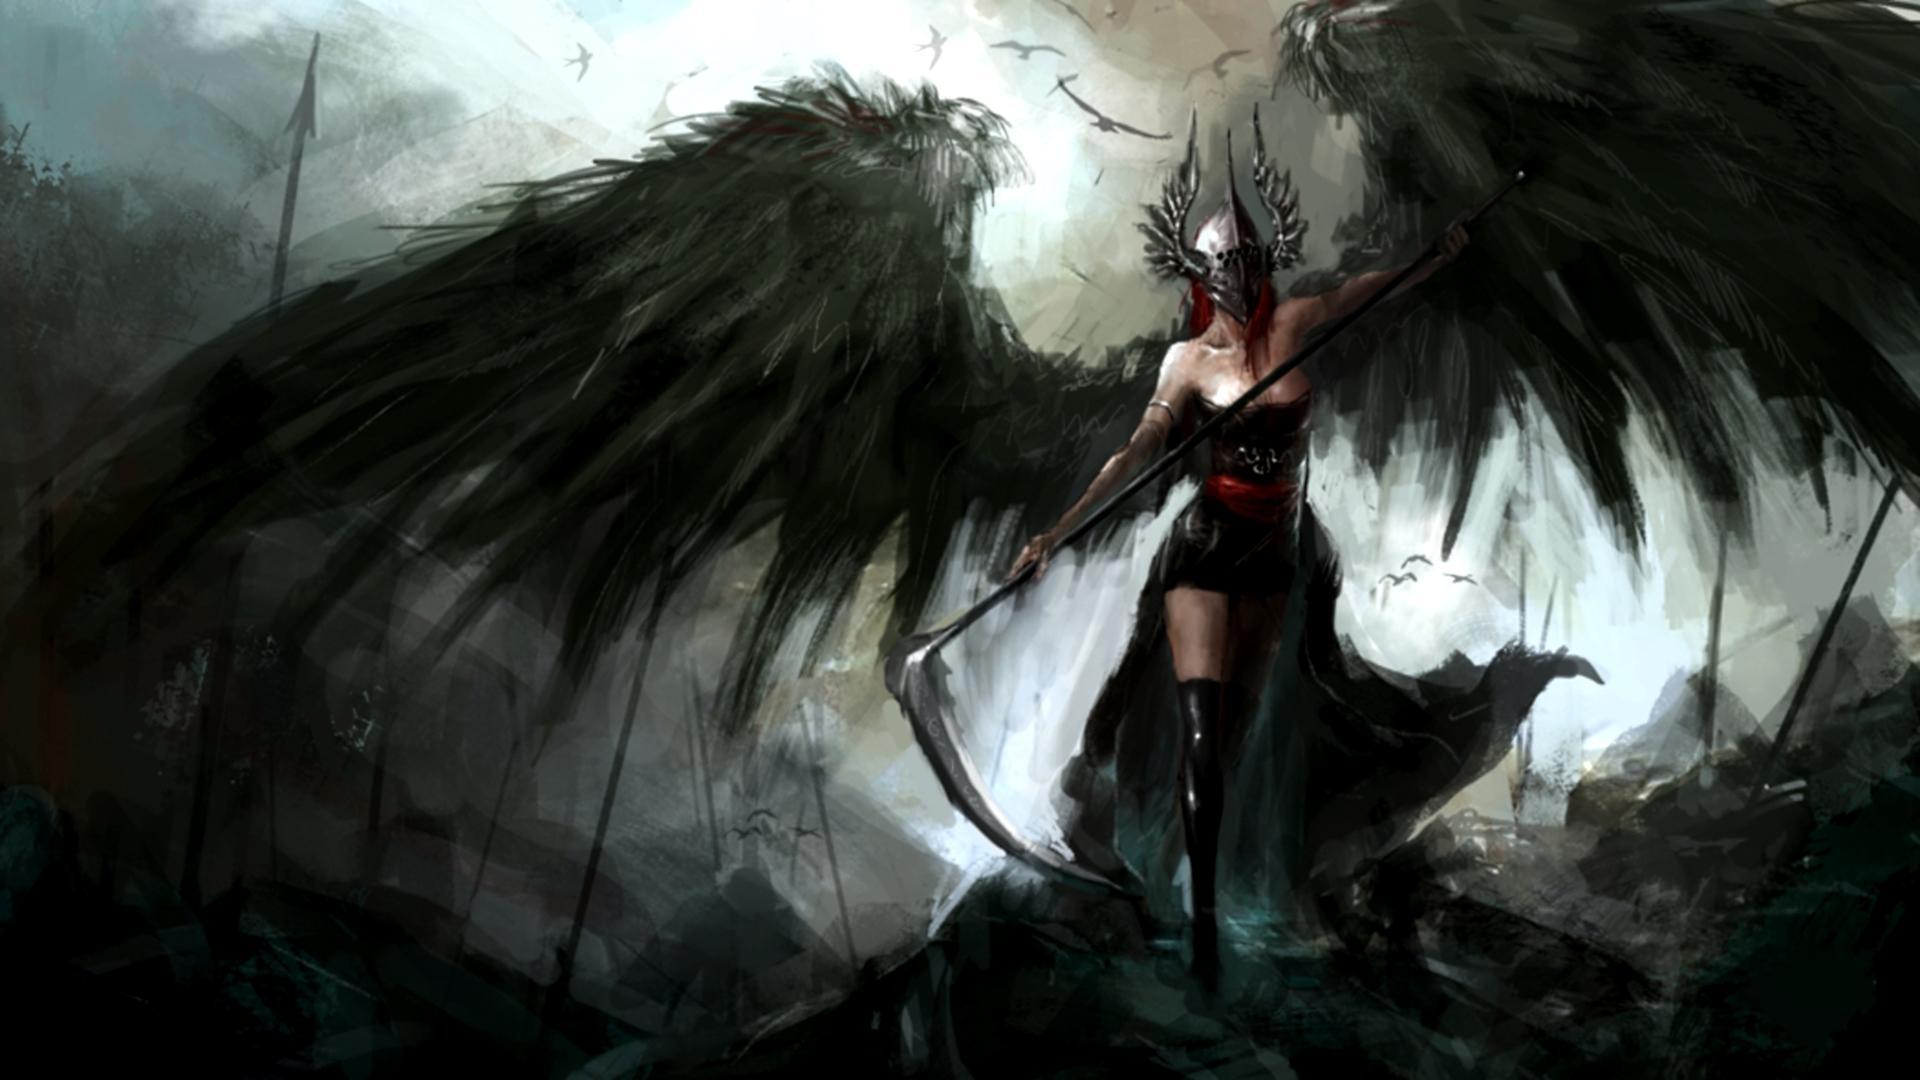 Anime Grim Reaper Girl Posted By John Thompson